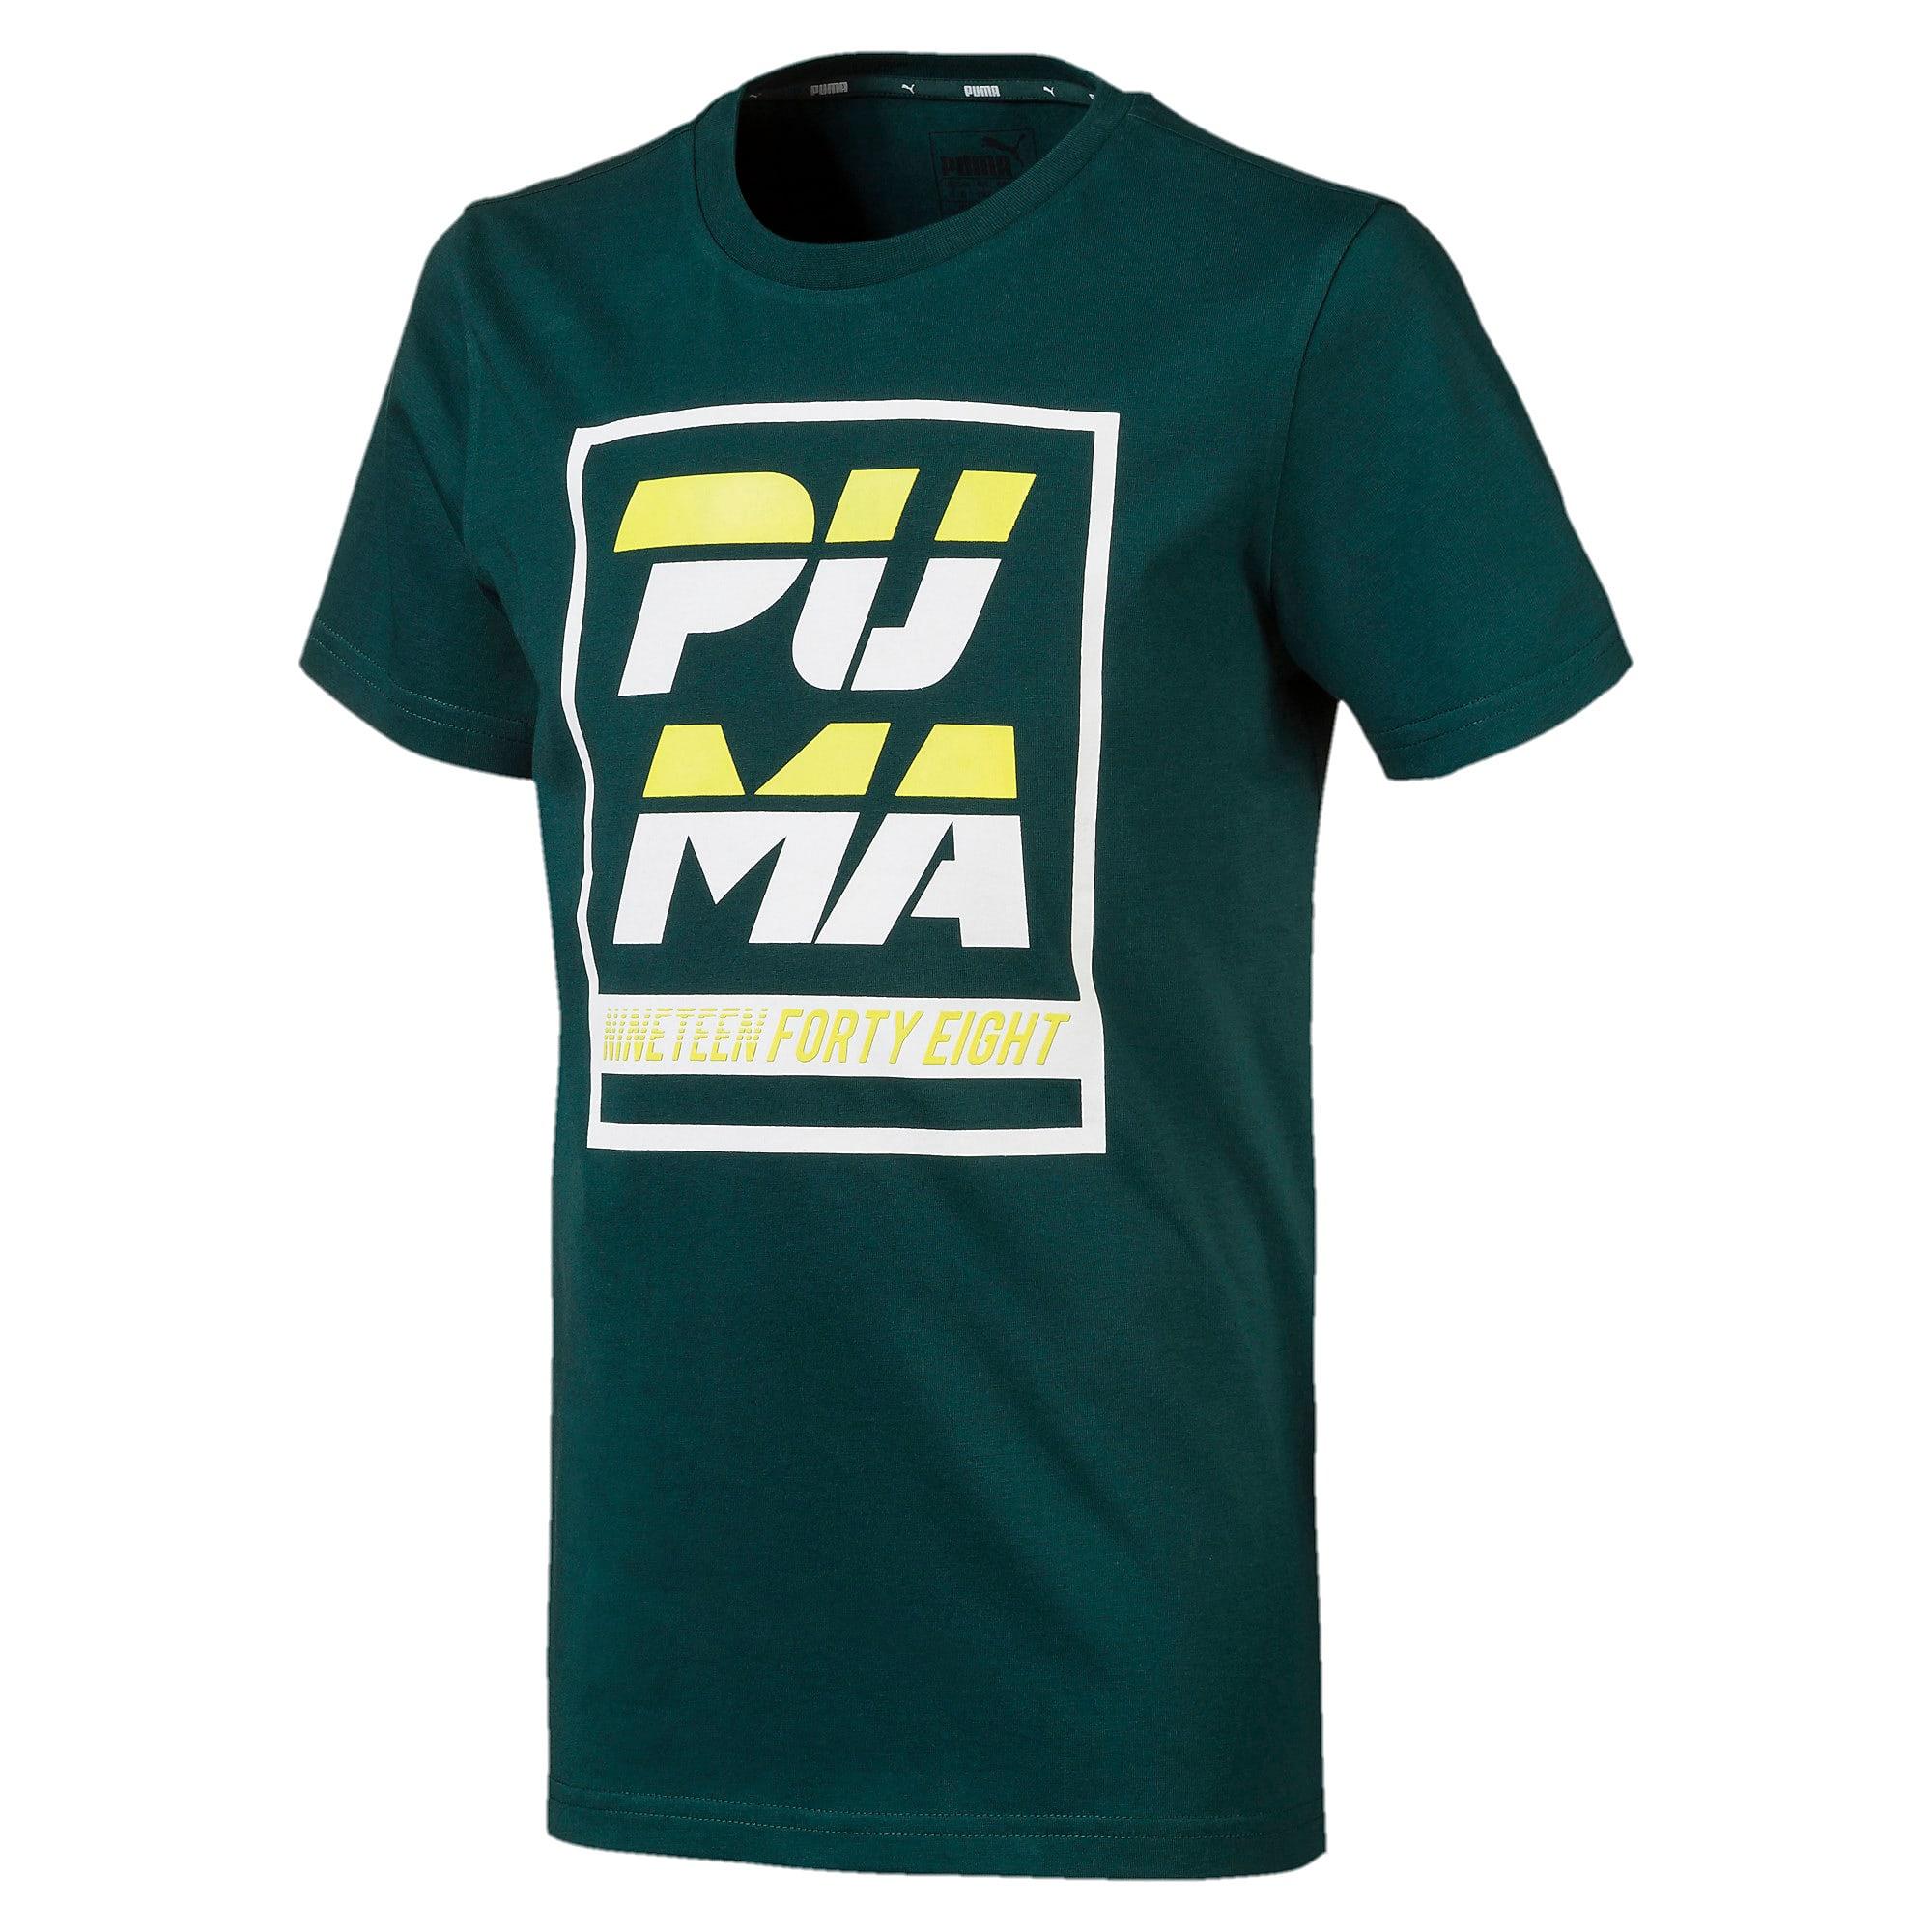 Thumbnail 1 of キッズ ALPHA SS グラフィック Tシャツ 半袖, Ponderosa Pine, medium-JPN